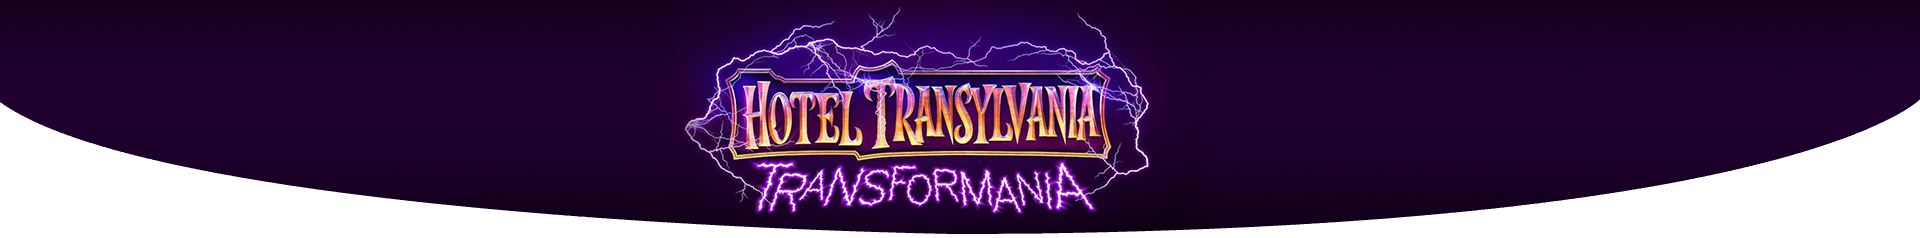 hotel-transylvania1